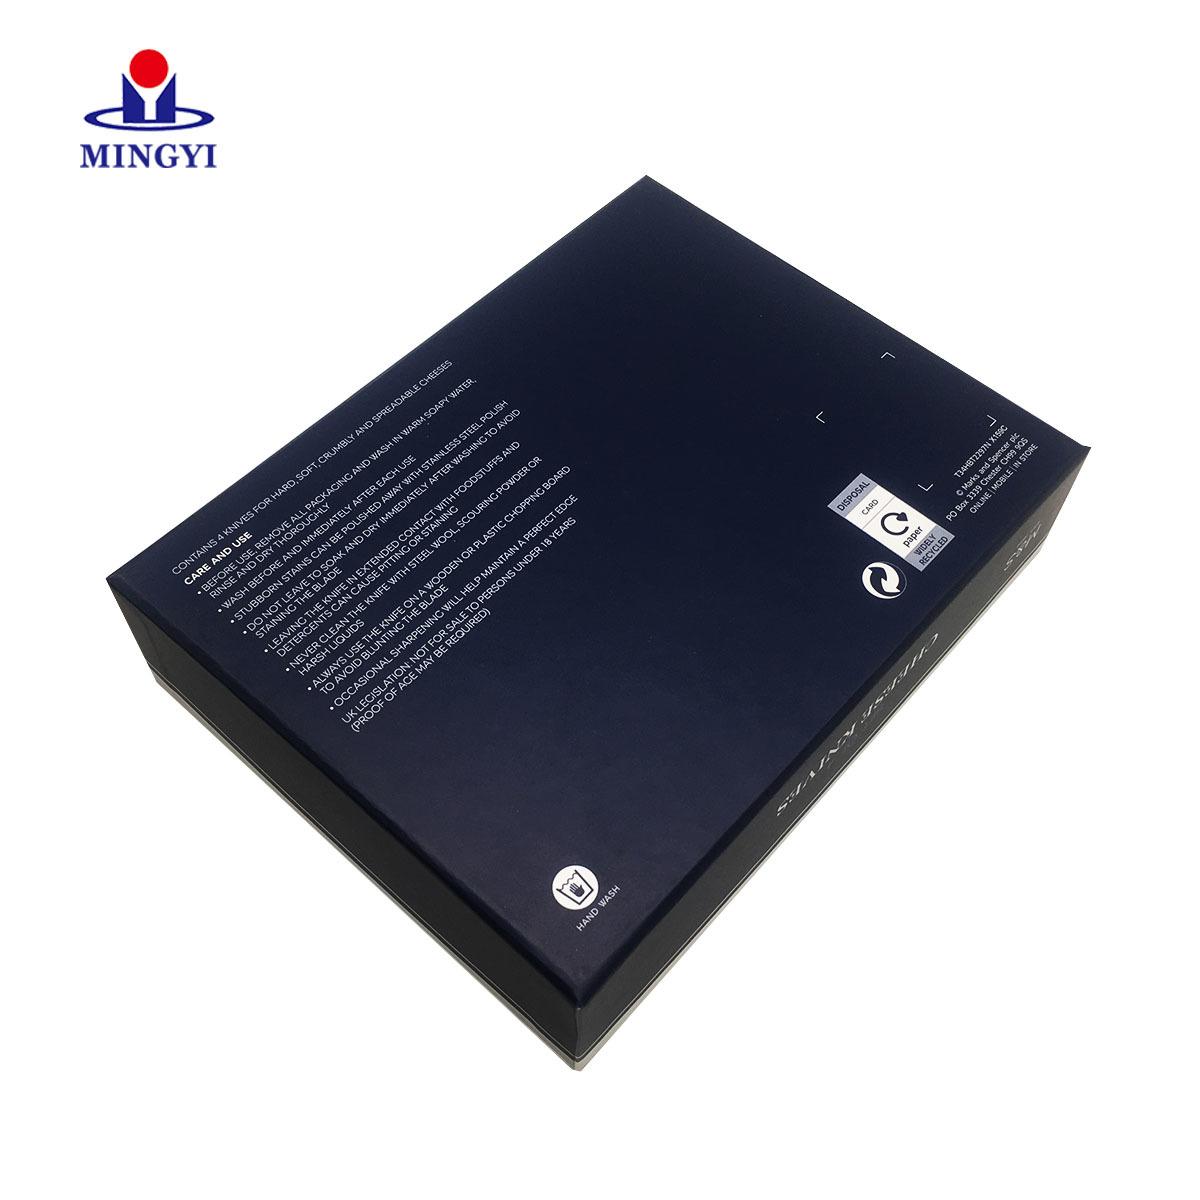 Hot watch gift box alcohol Mingyi Printing Brand